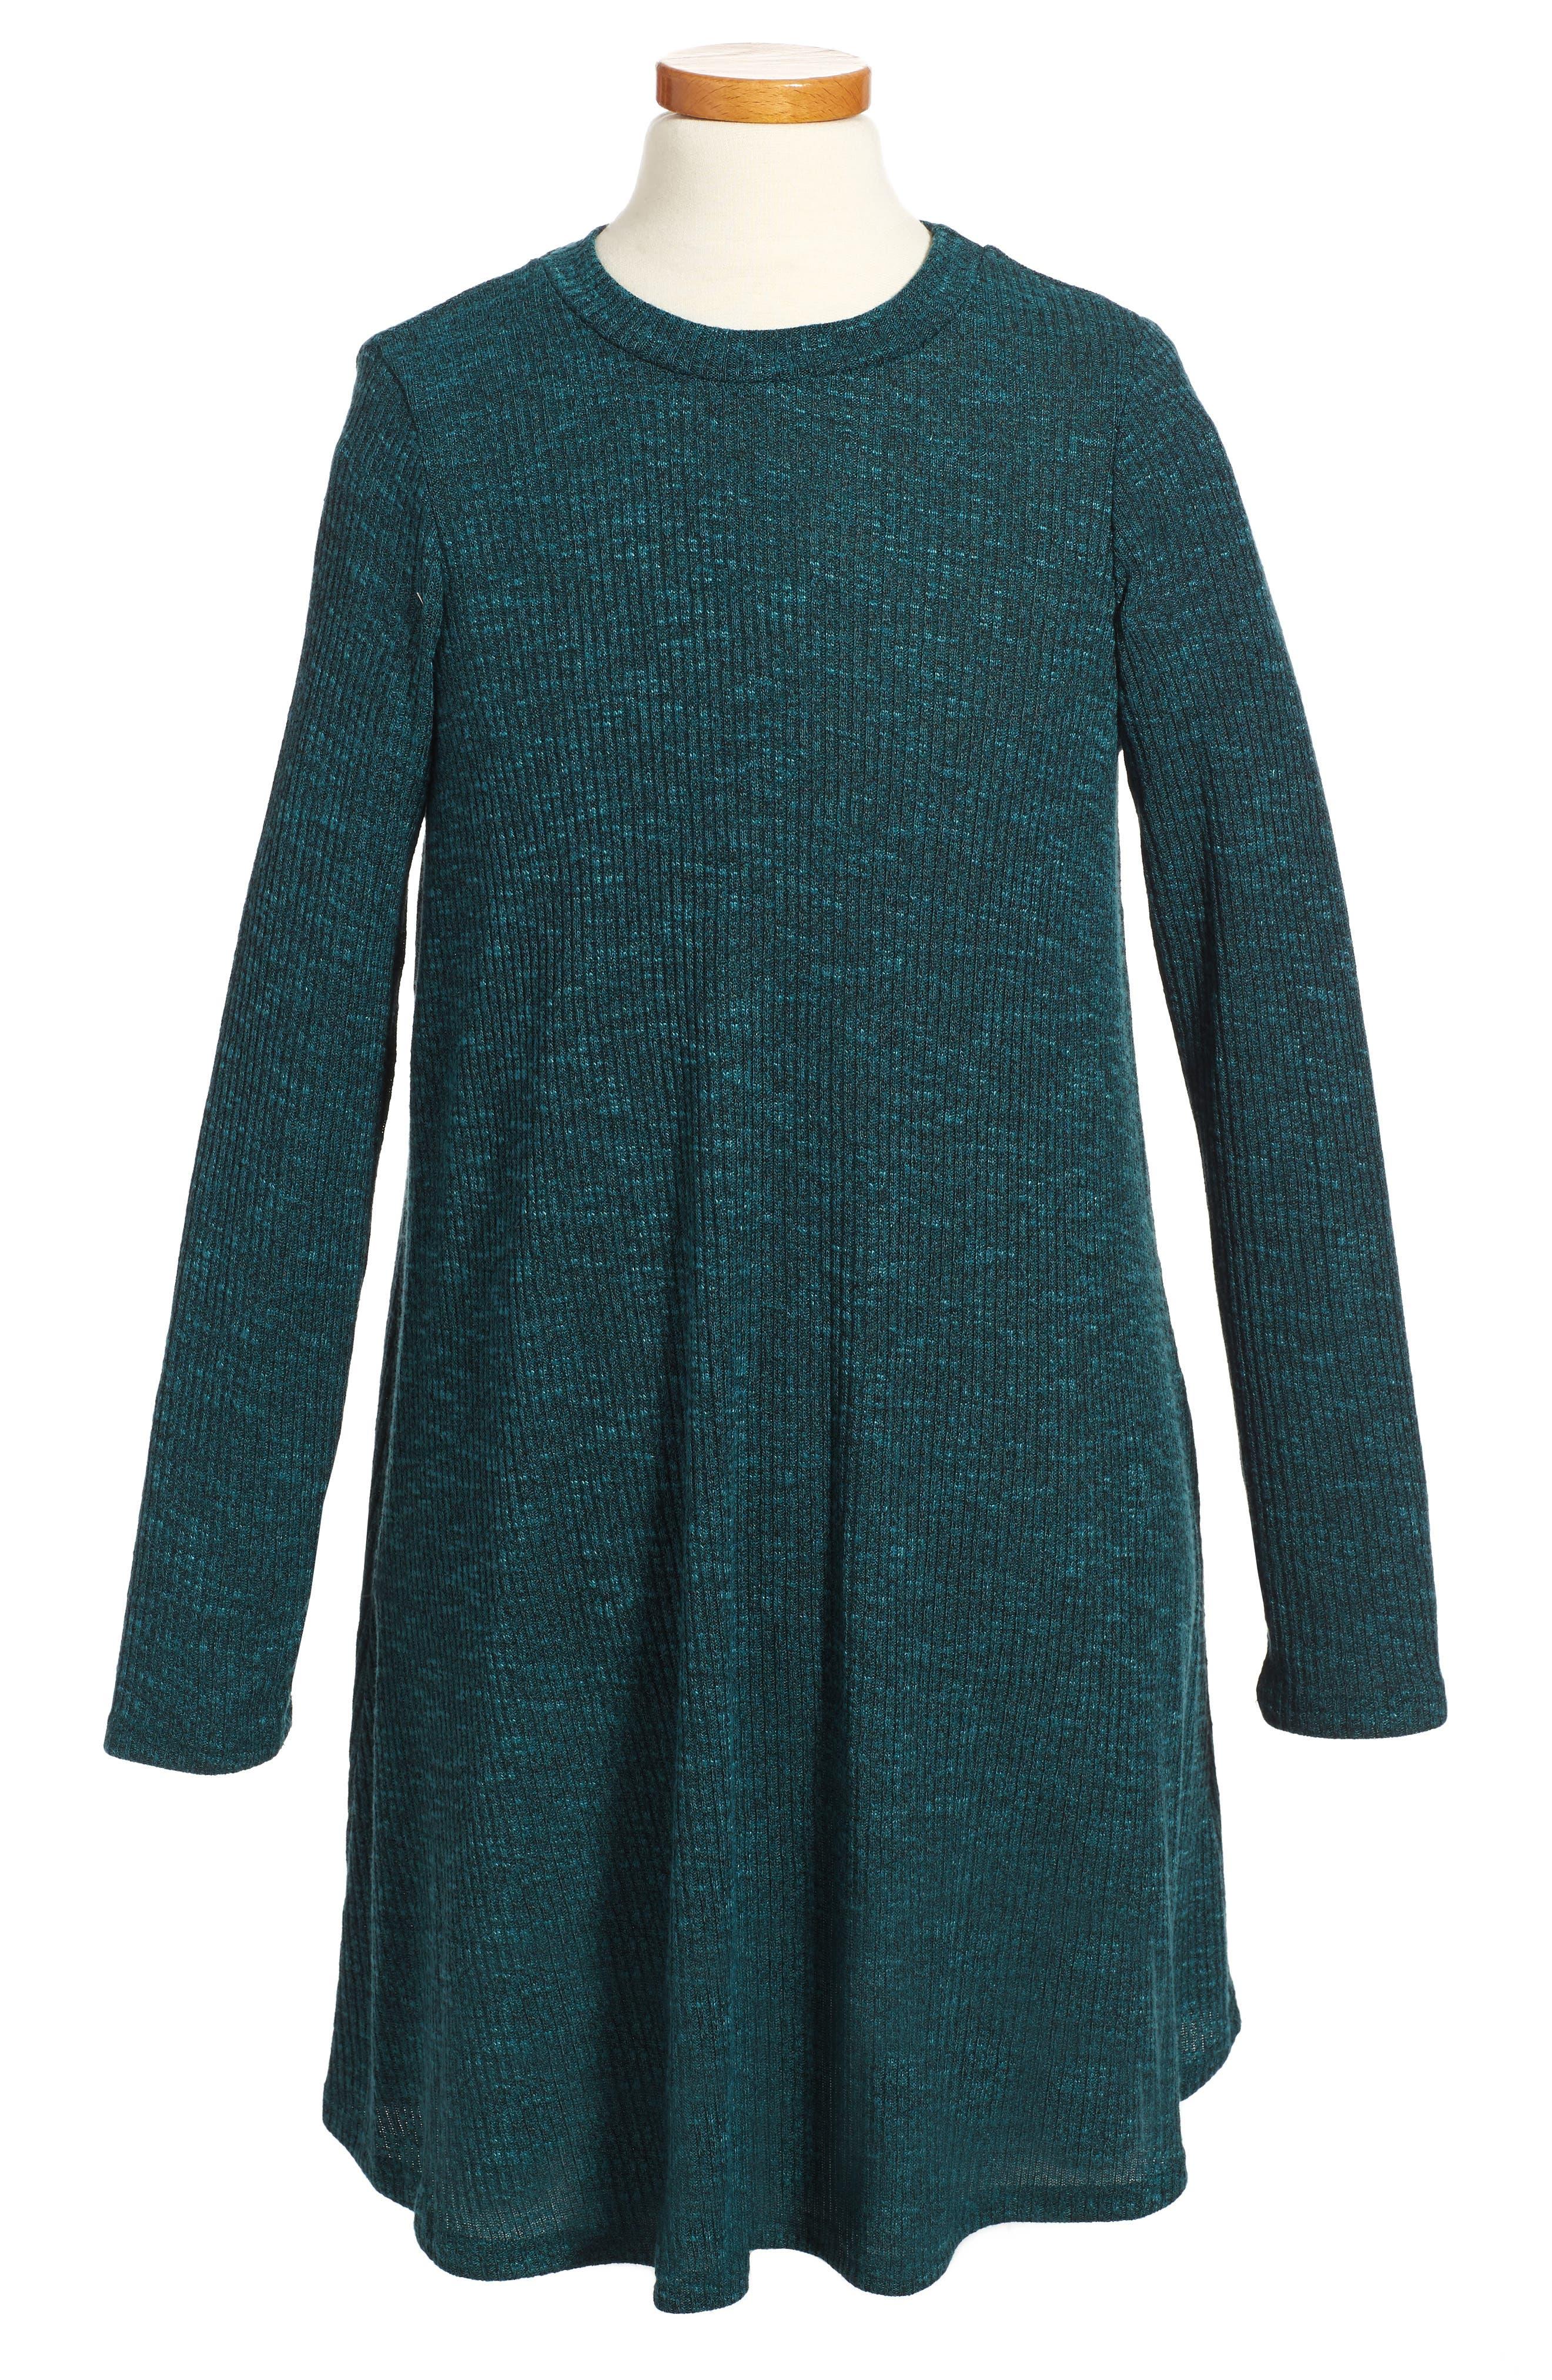 Rib Knit Sweater Dress,                         Main,                         color, 359